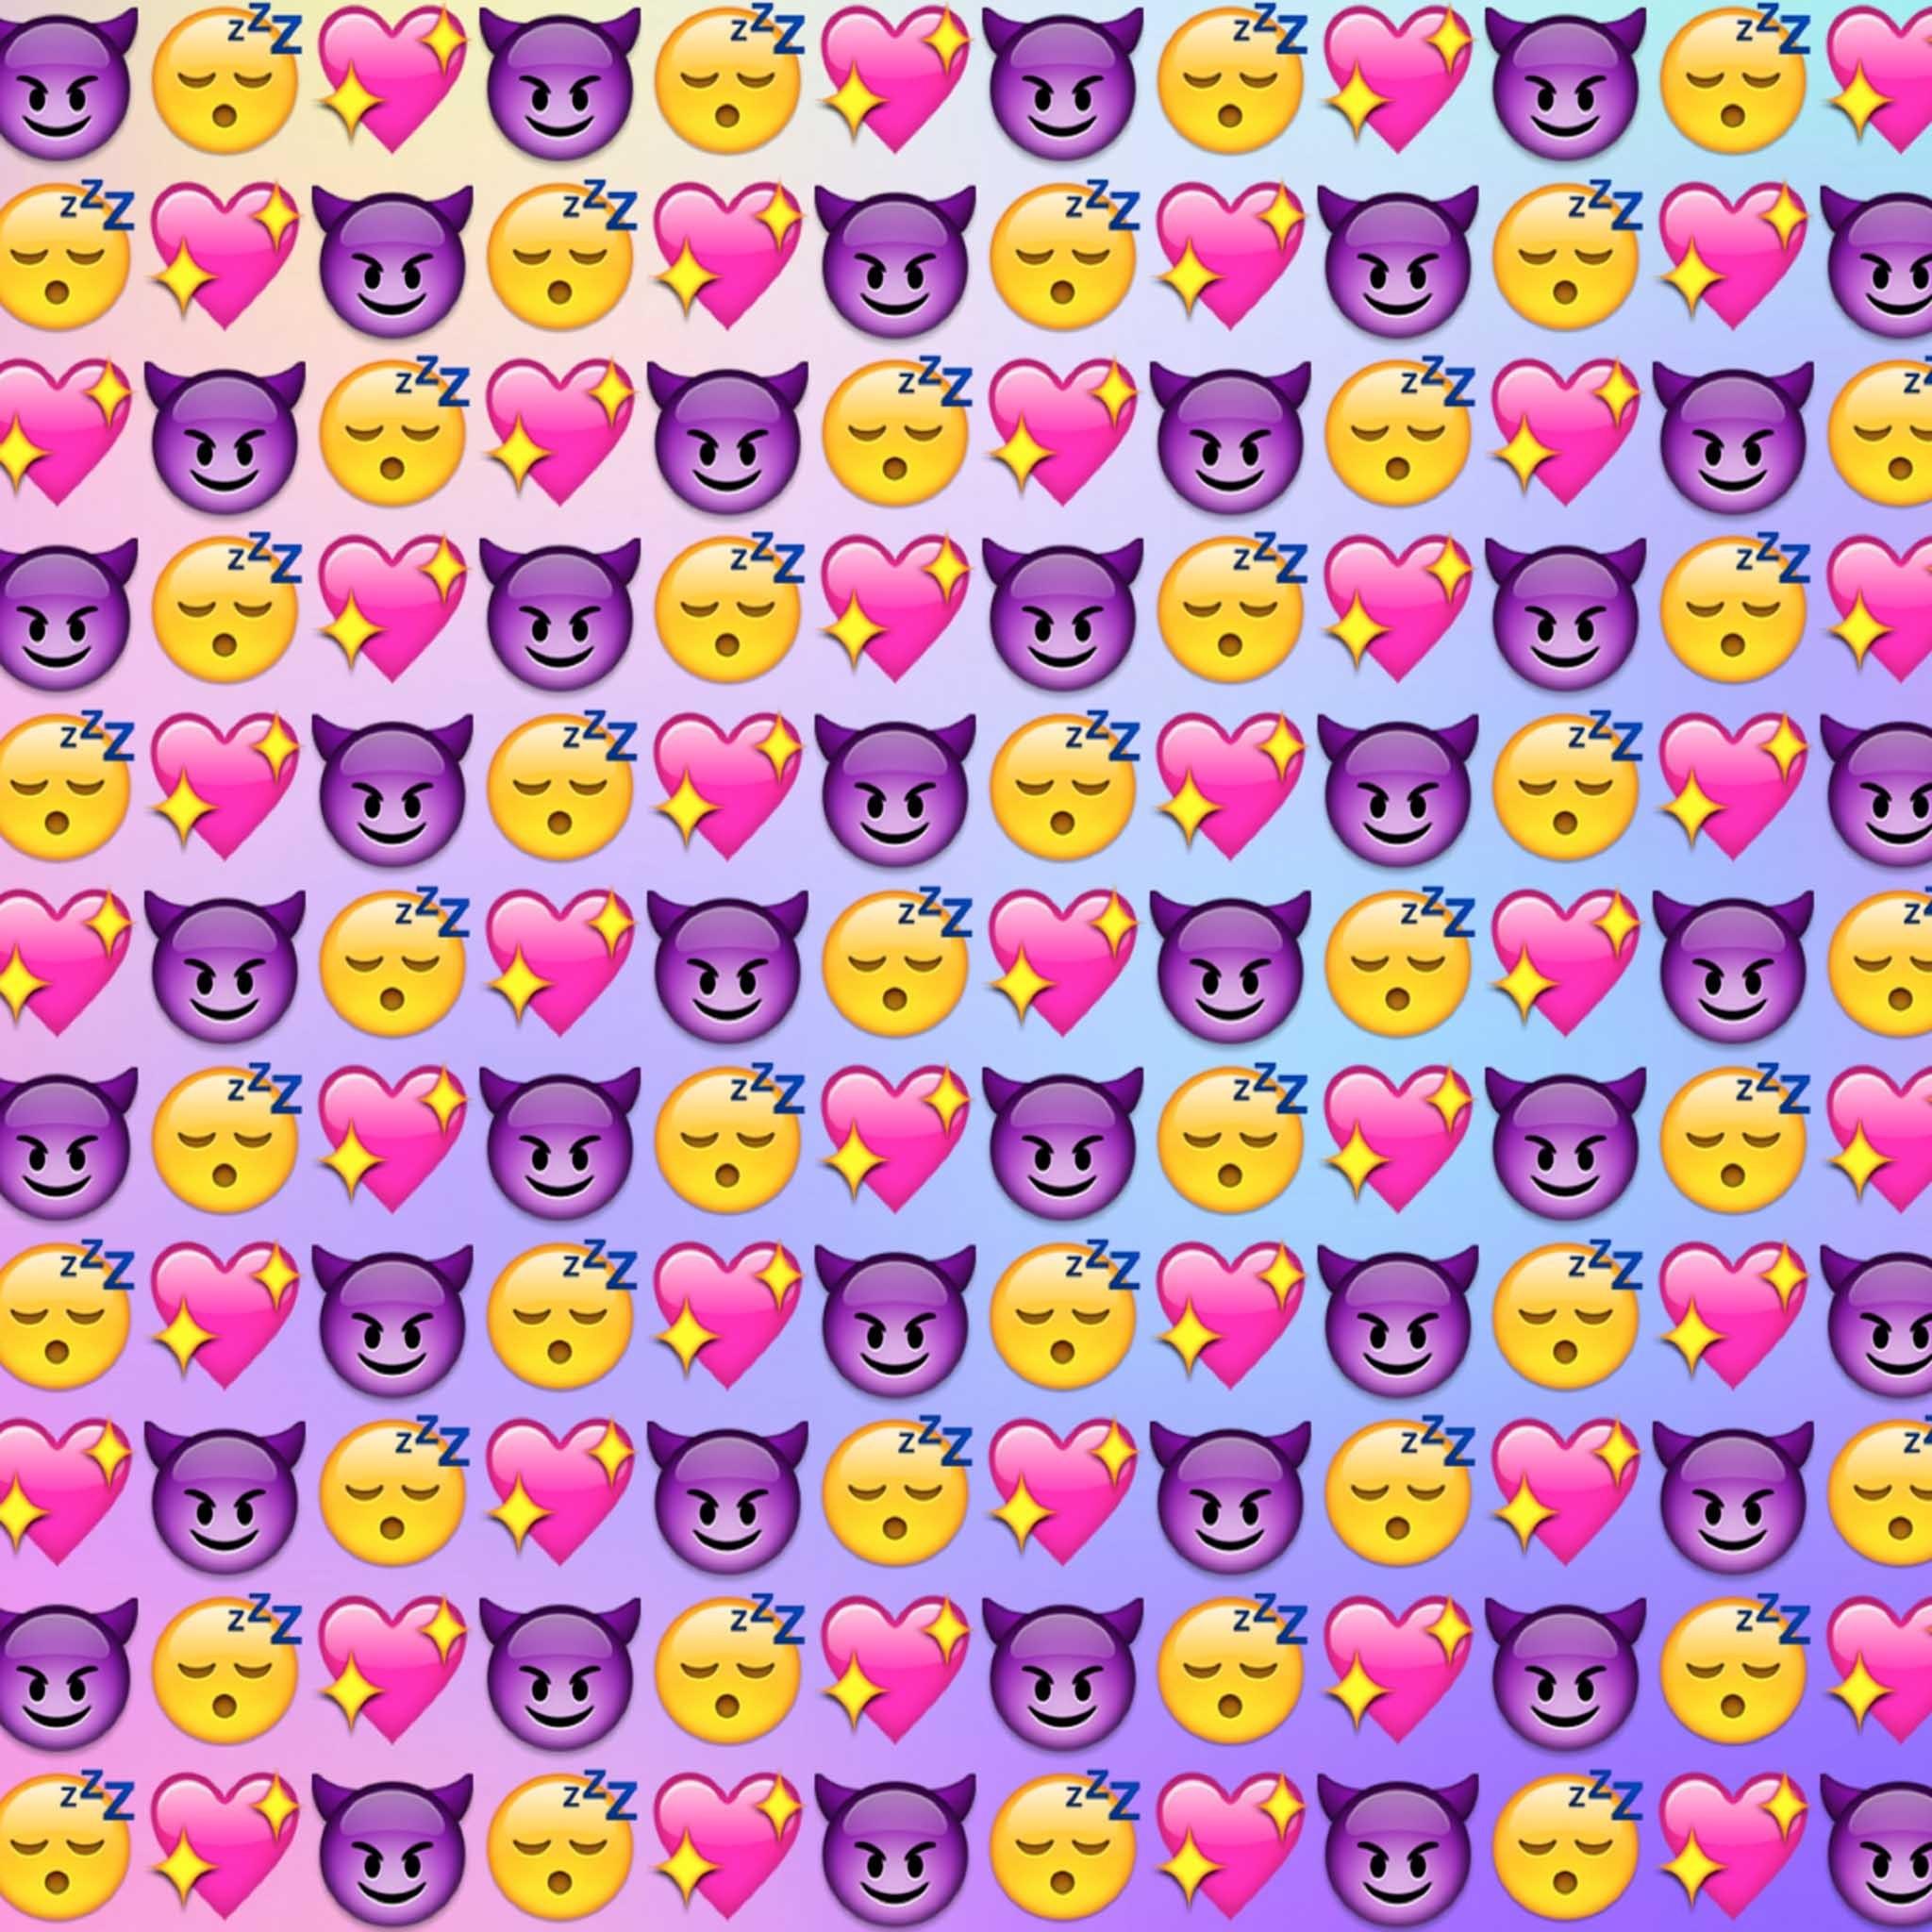 Emoji Wallpaper ·① Download Free Amazing High Resolution